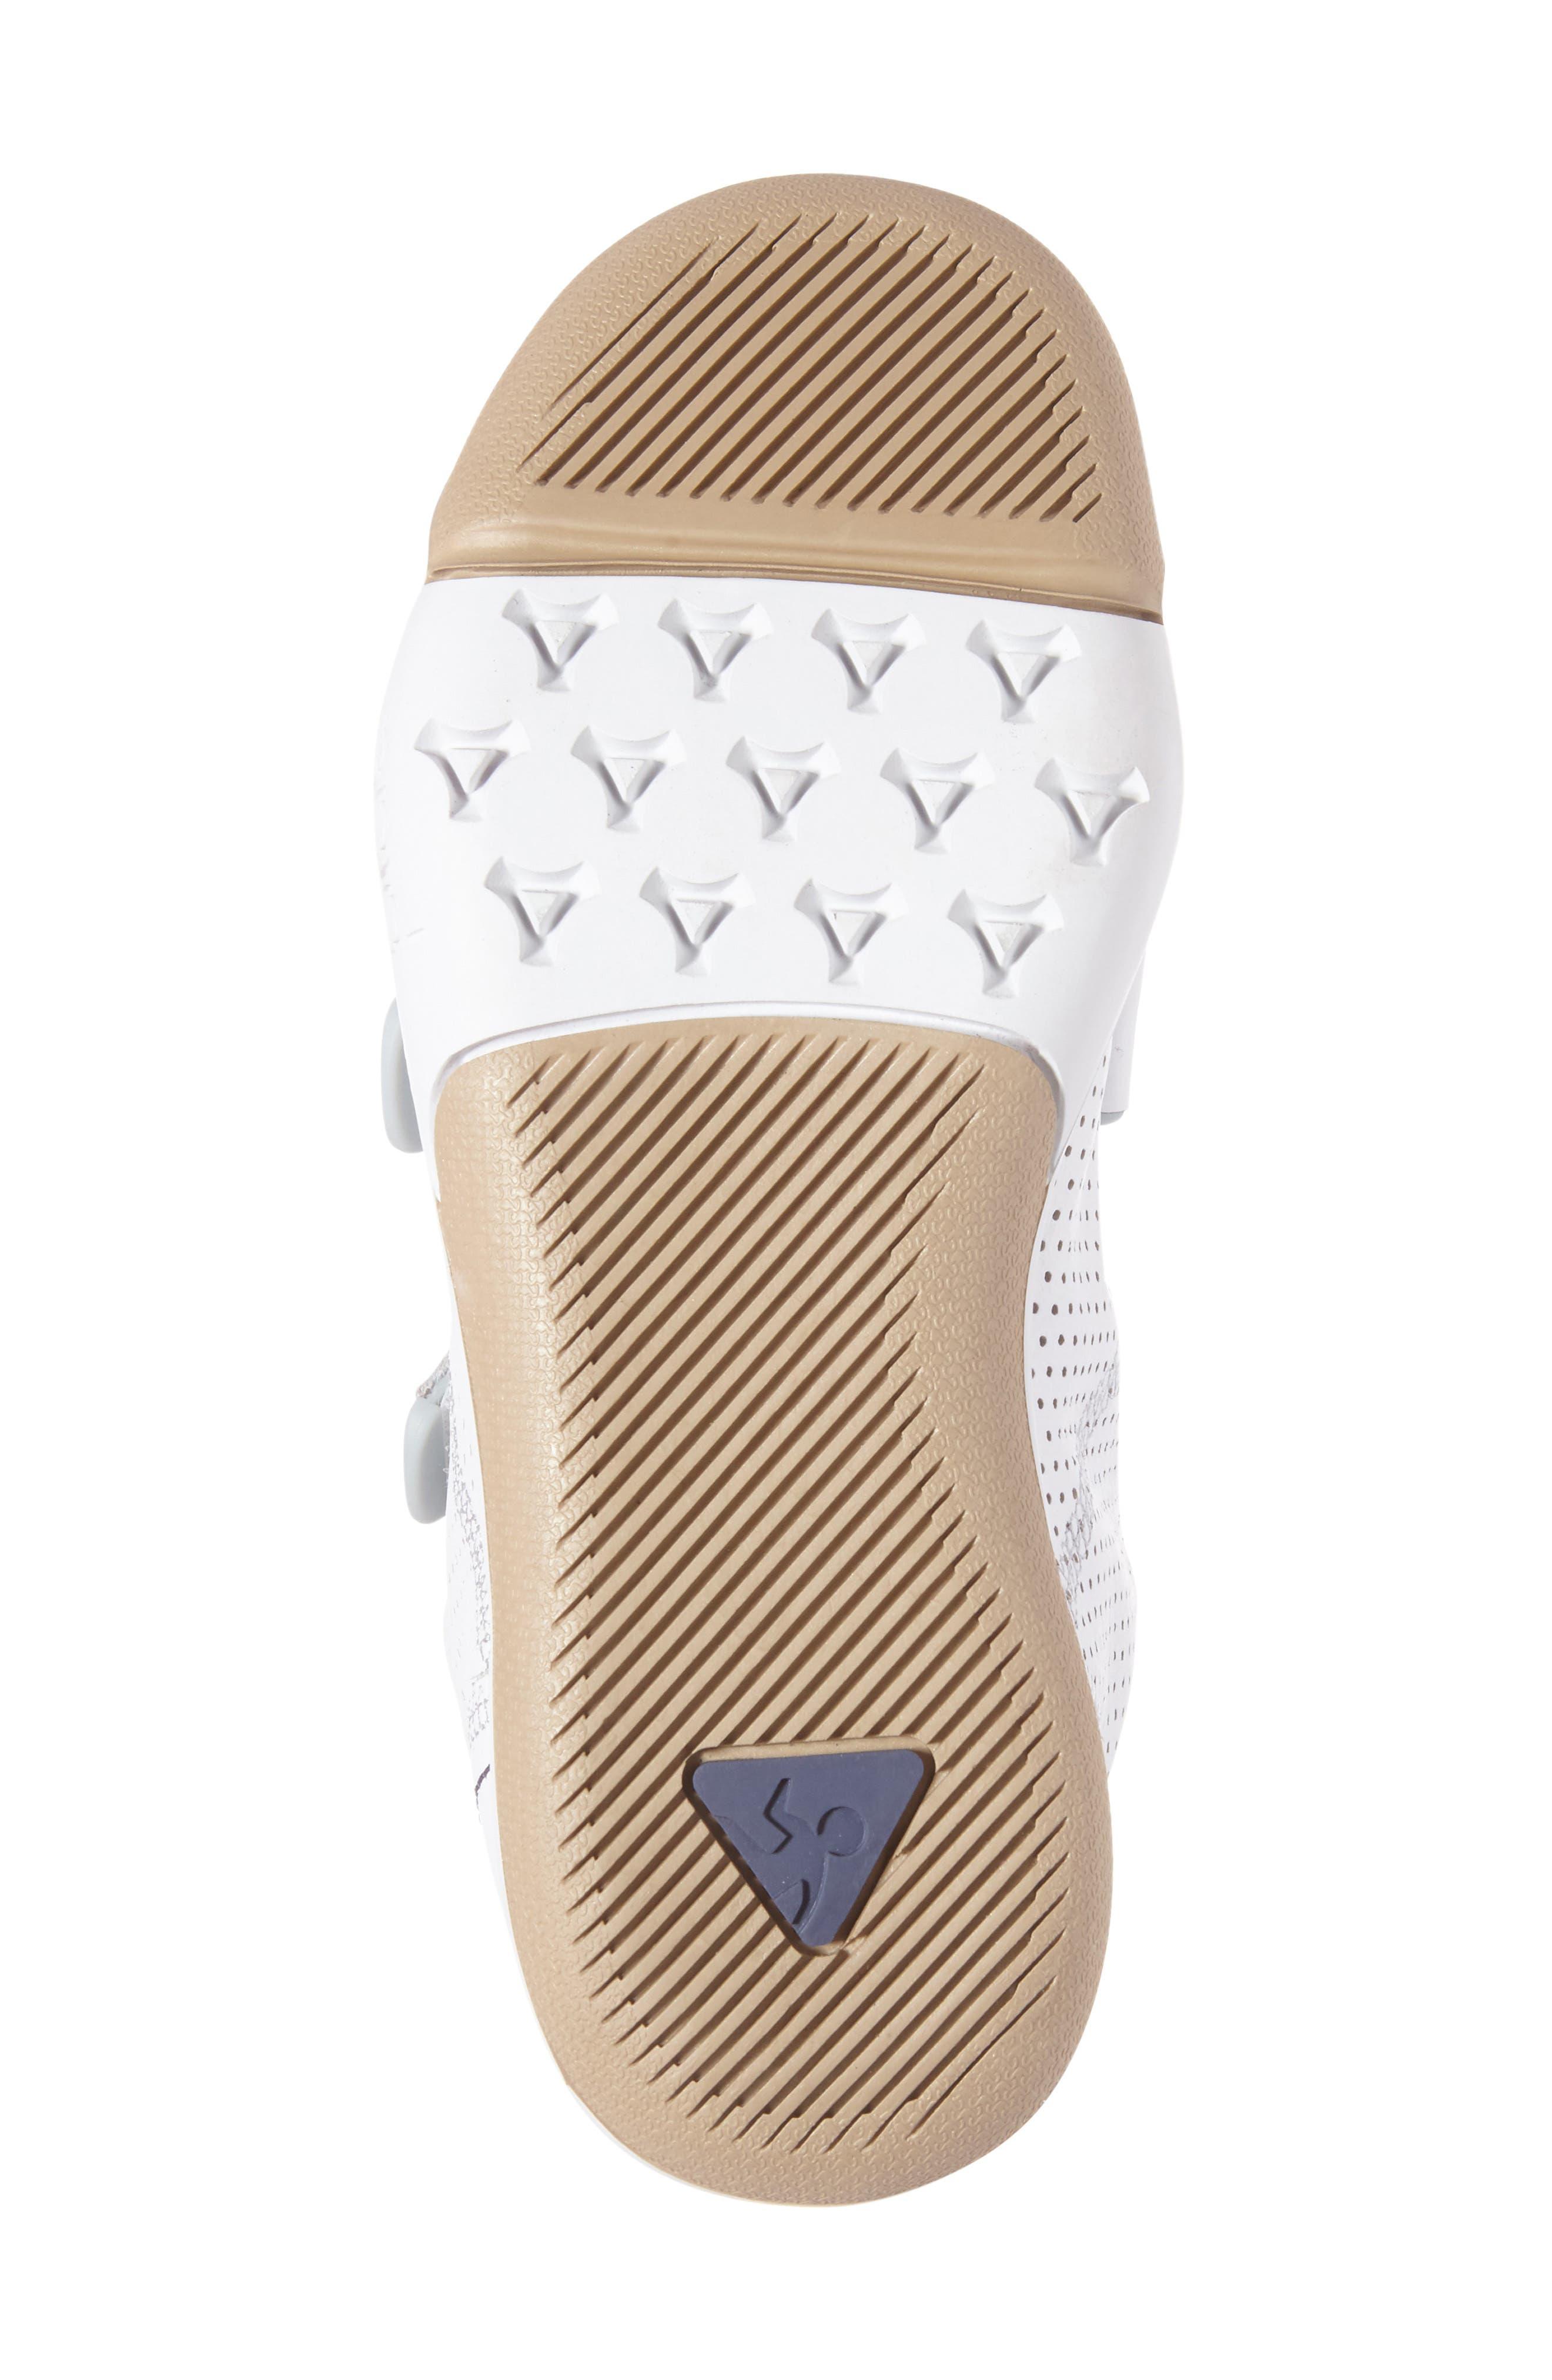 Max Customizable High Top Sneaker,                             Alternate thumbnail 4, color,                             710